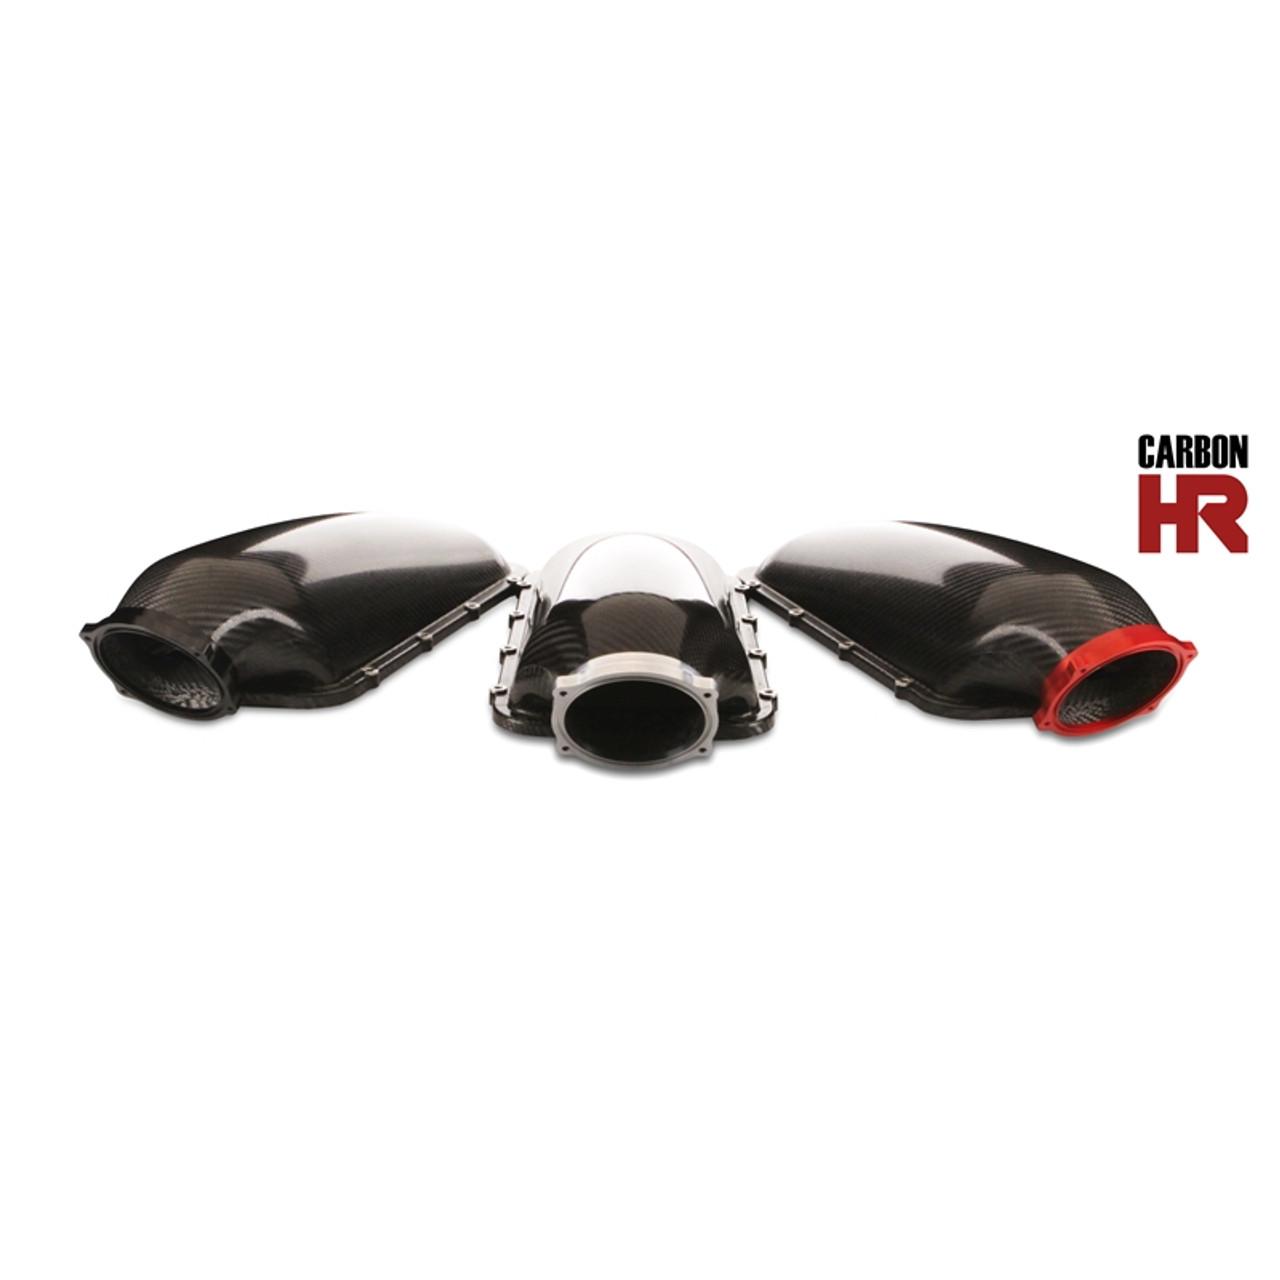 Performance Design Carbon HR Intake Manifold Lid